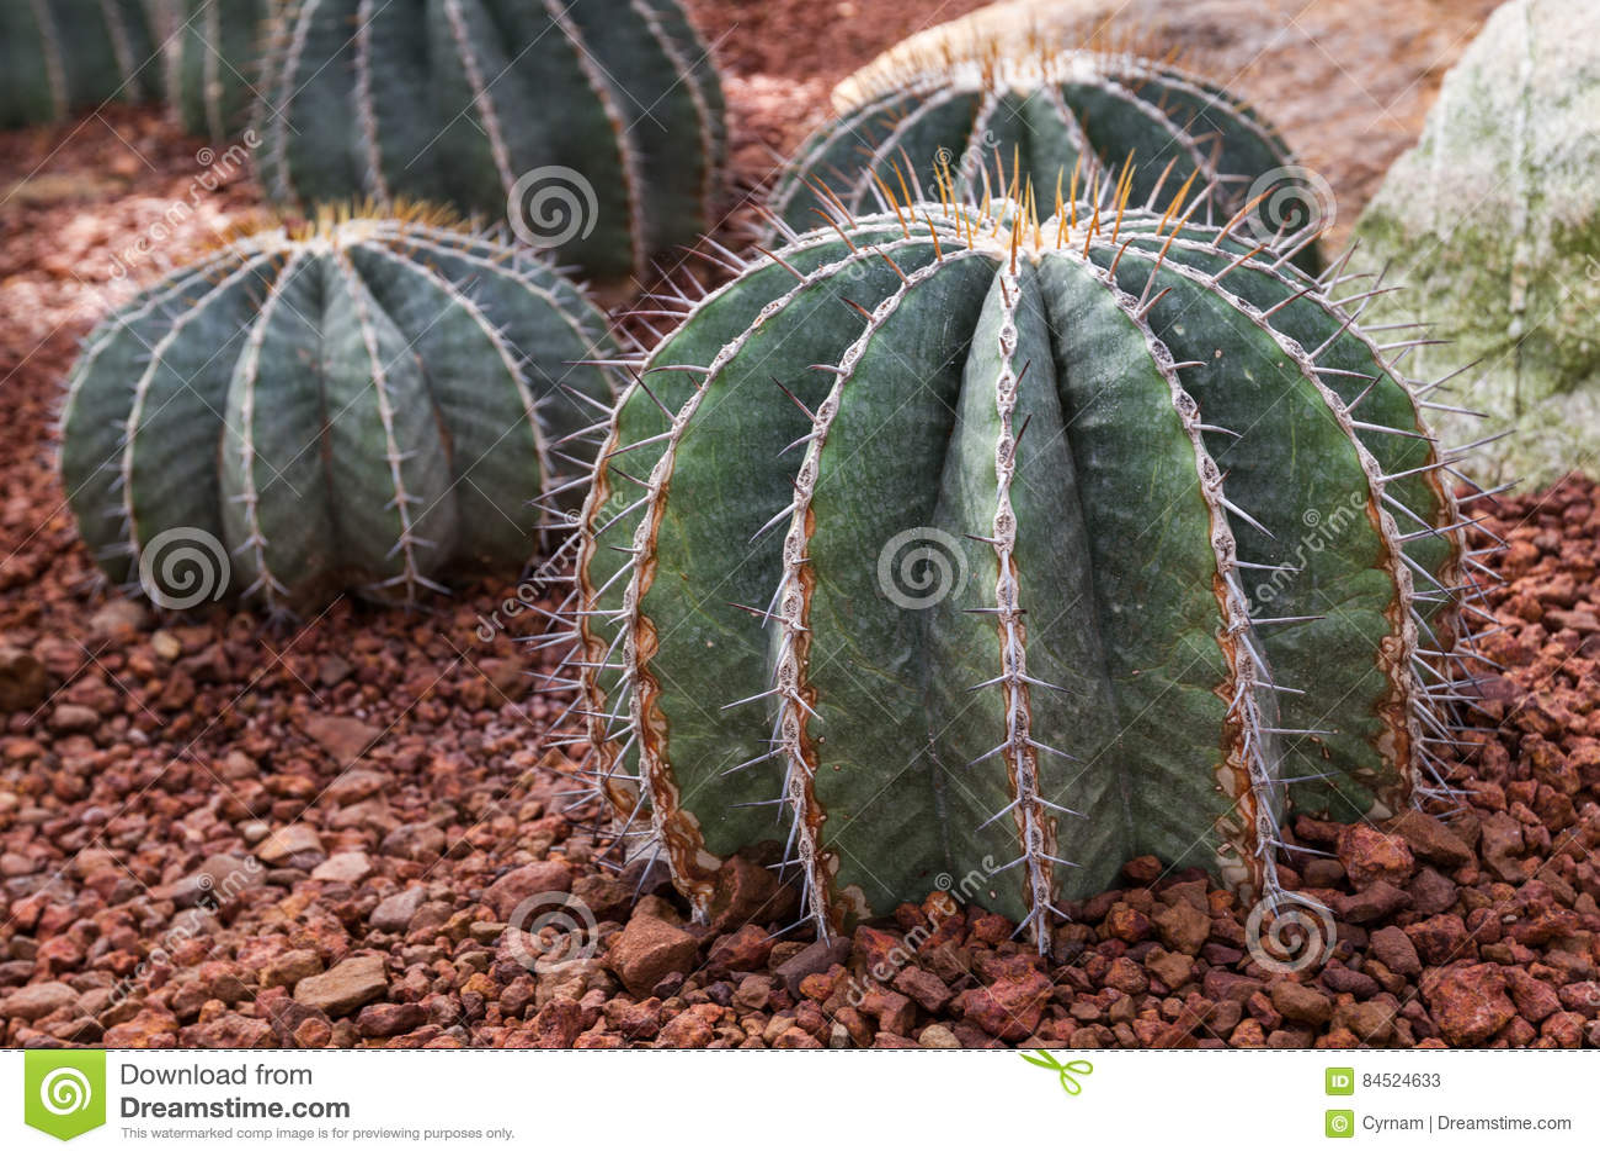 Beautiful cactus echinocactus in botanical garden